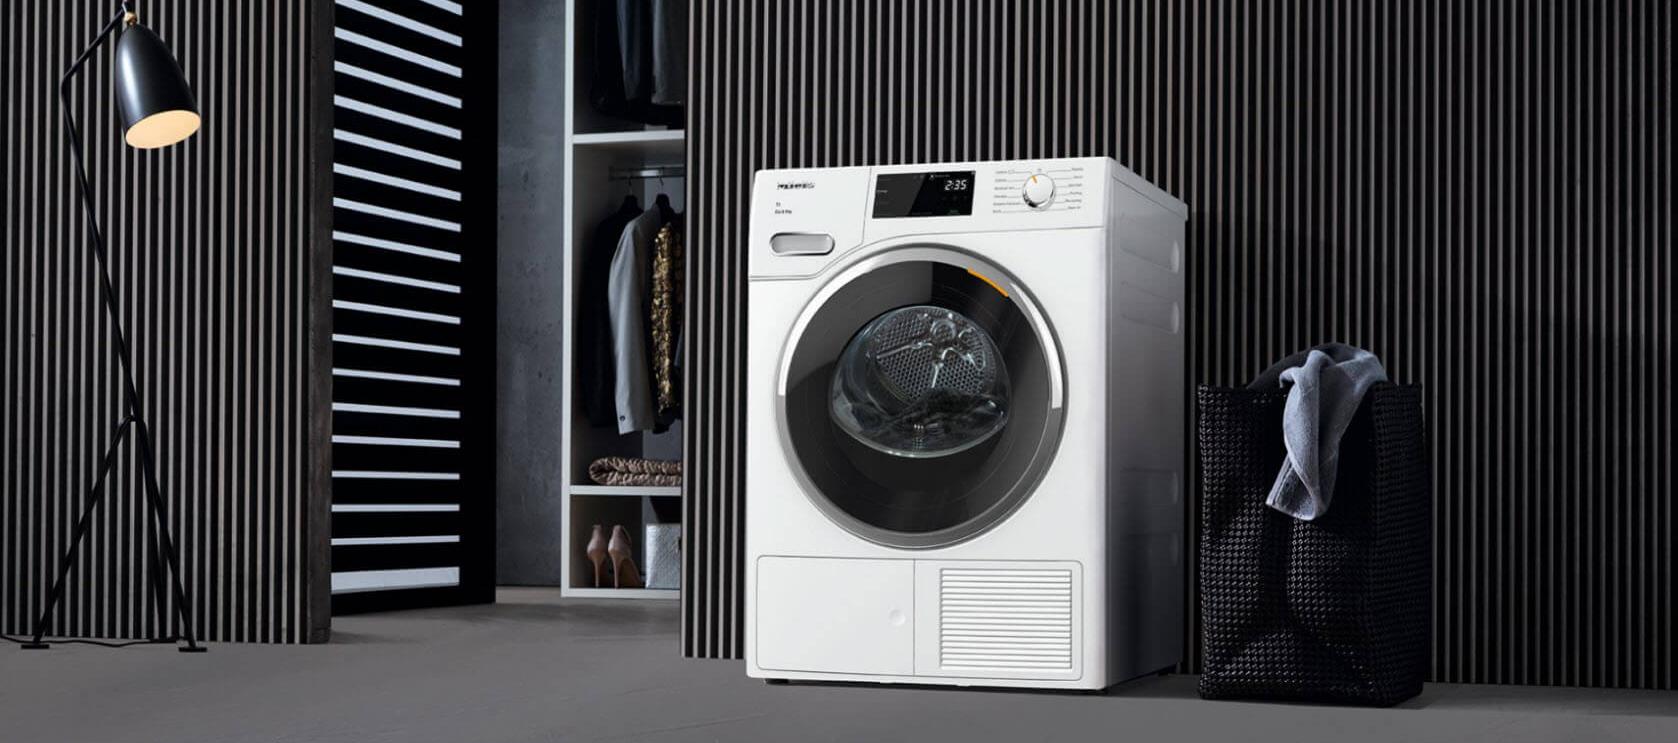 Miele TWF 720 WP: most energy-efficient clothes dryer